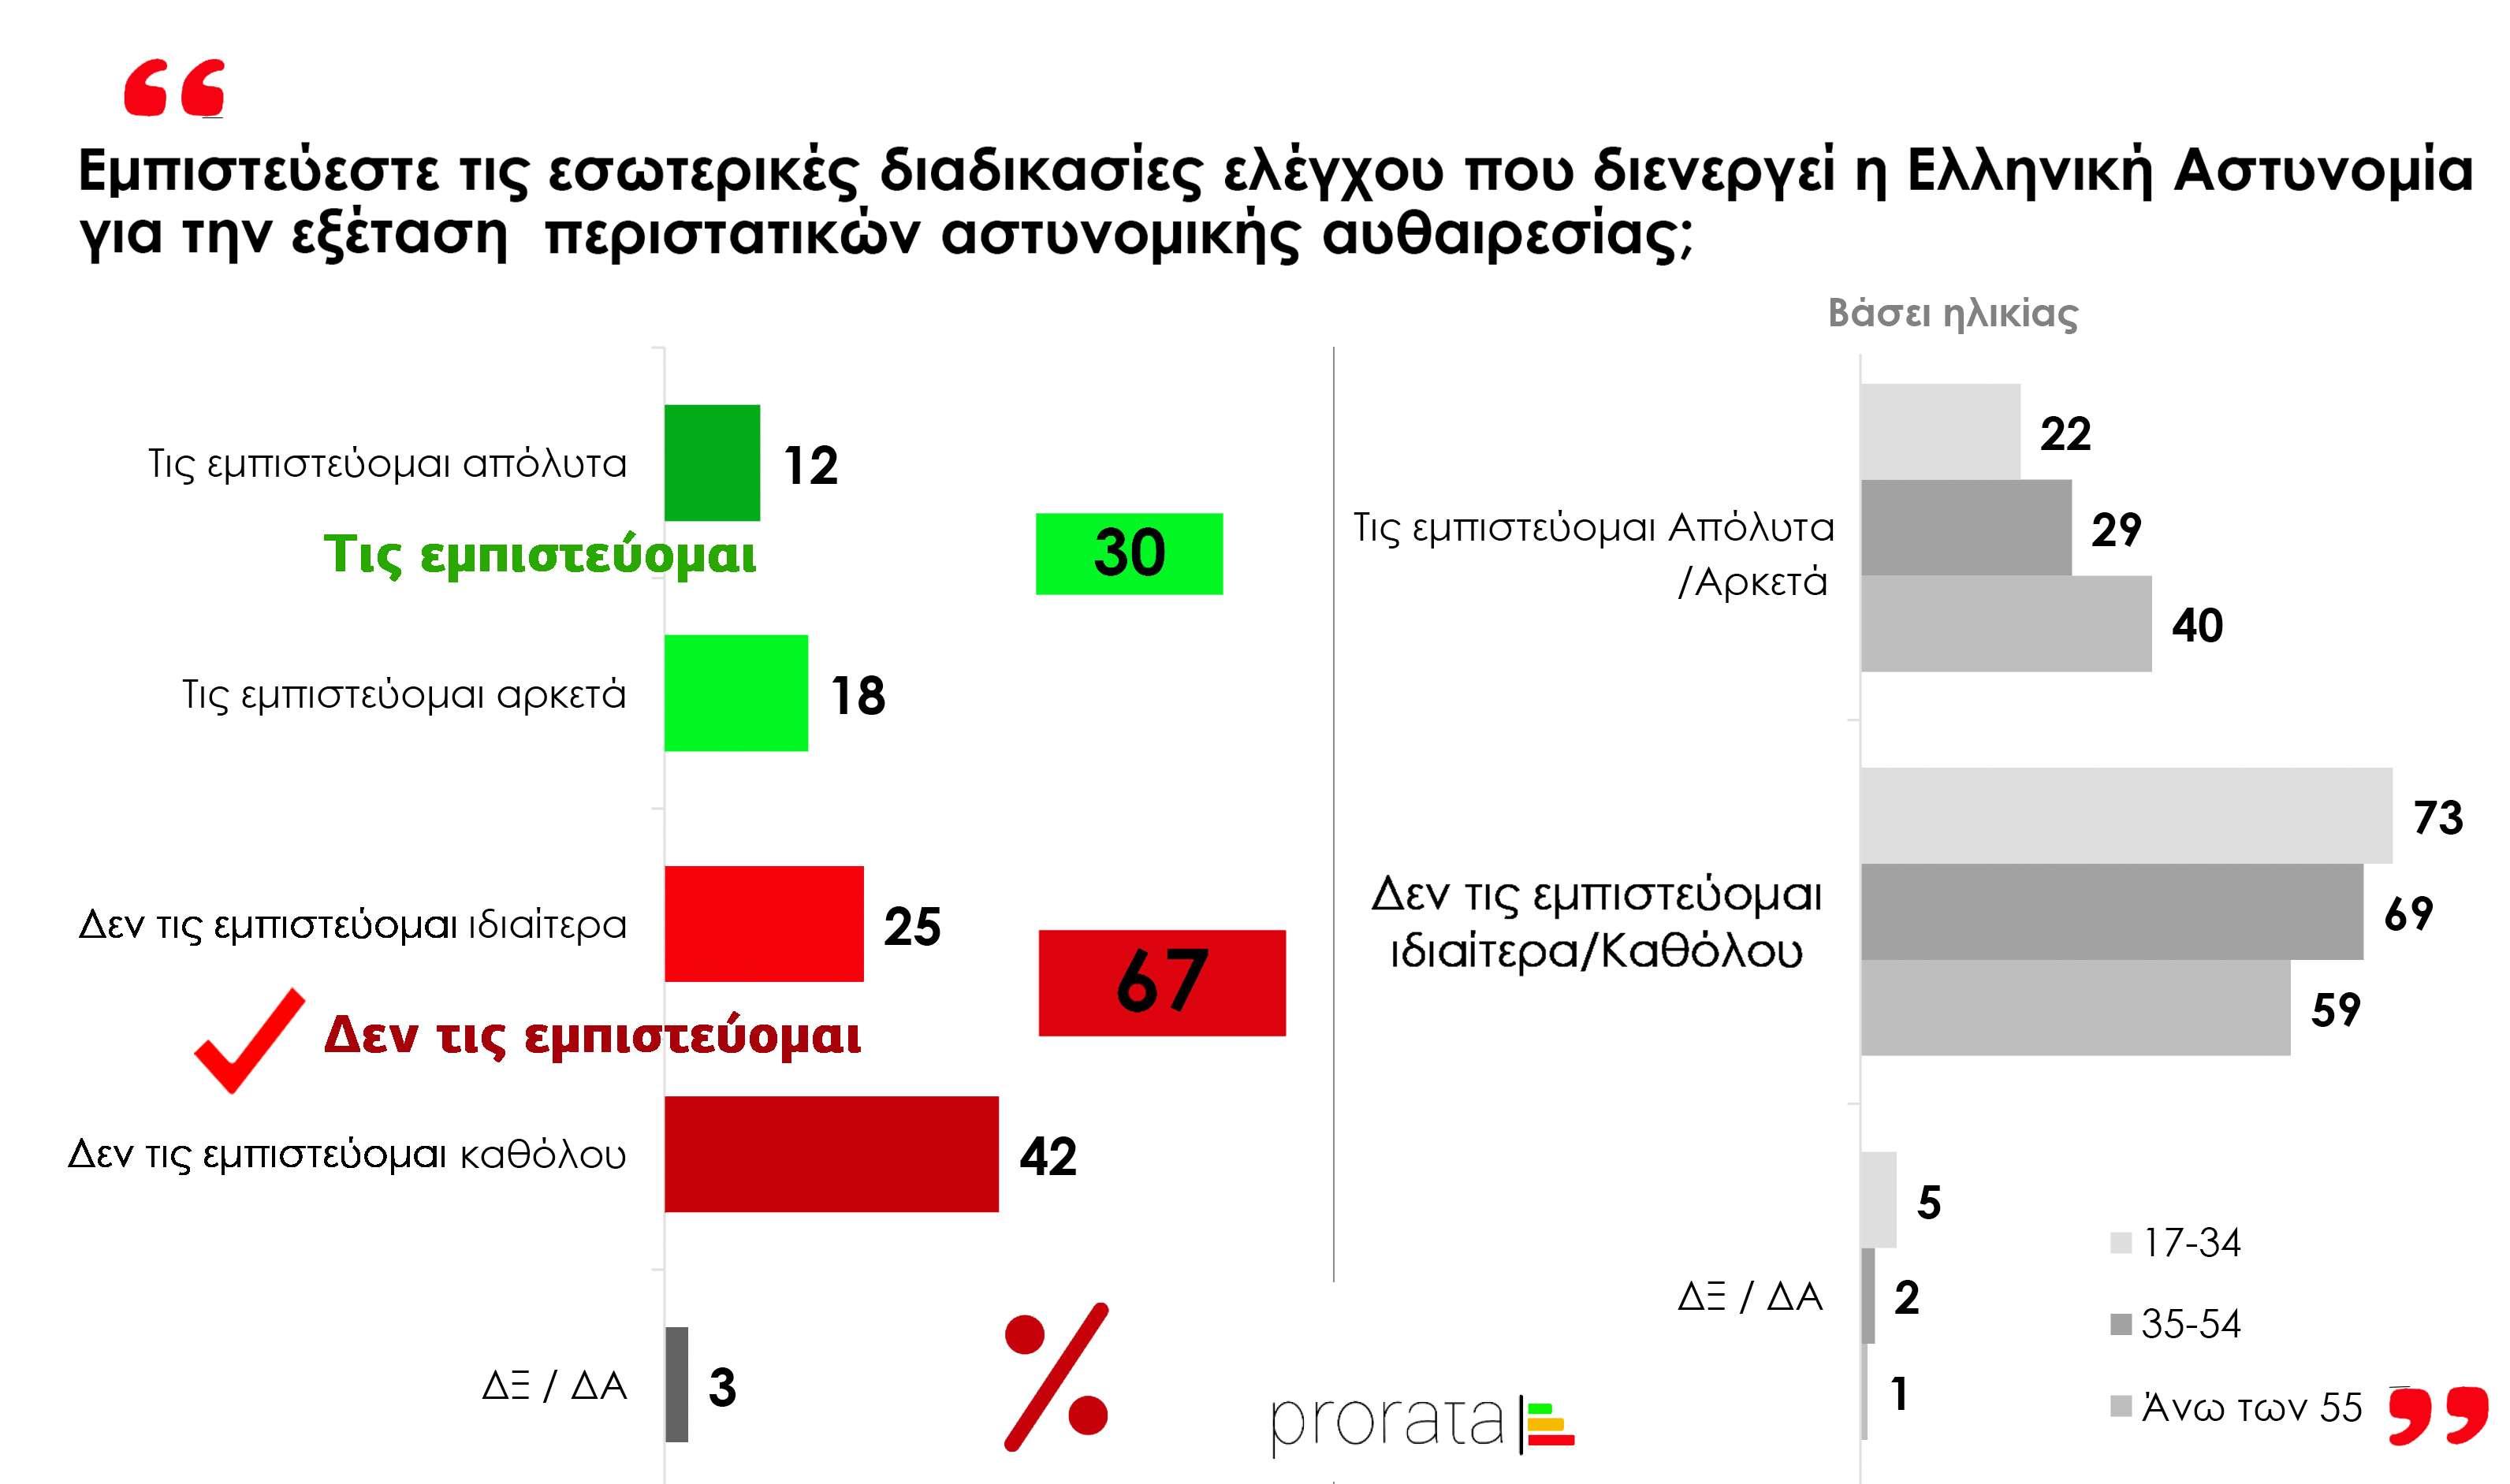 Prorata Εμπιστεύεστε τις εσωτερικές διαδικασίες ελέγχου που διενεργεί η Ελληνική Αστυνομία